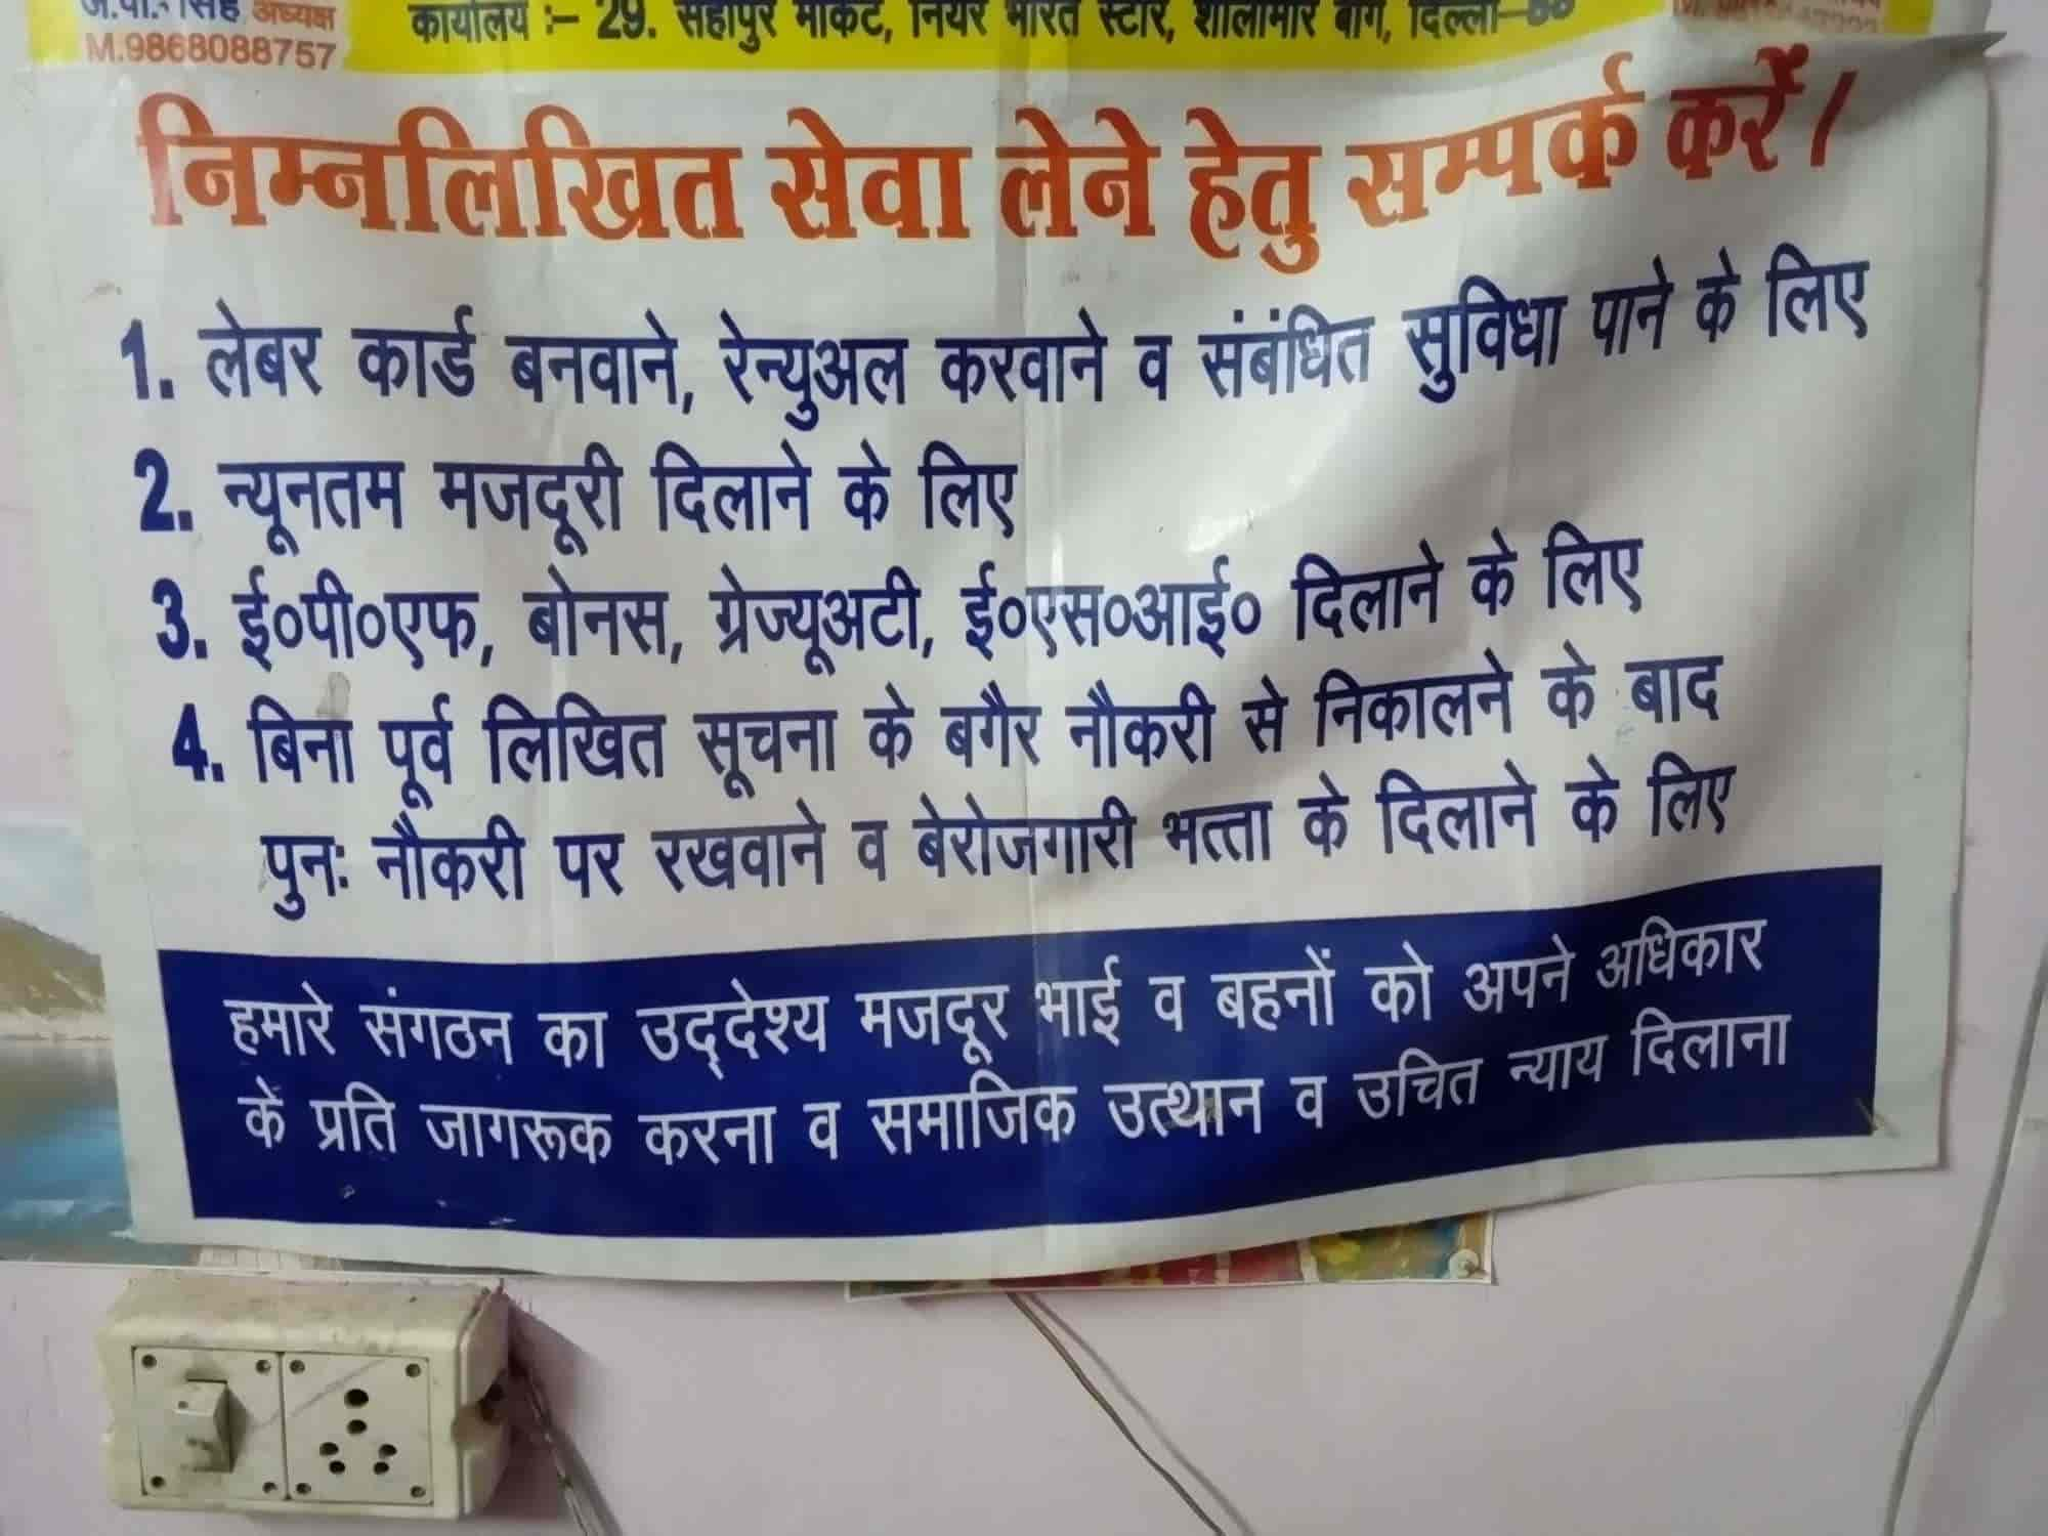 Nirman Mazdoor Sangh in Shalimar Bagh, Delhi - Justdial